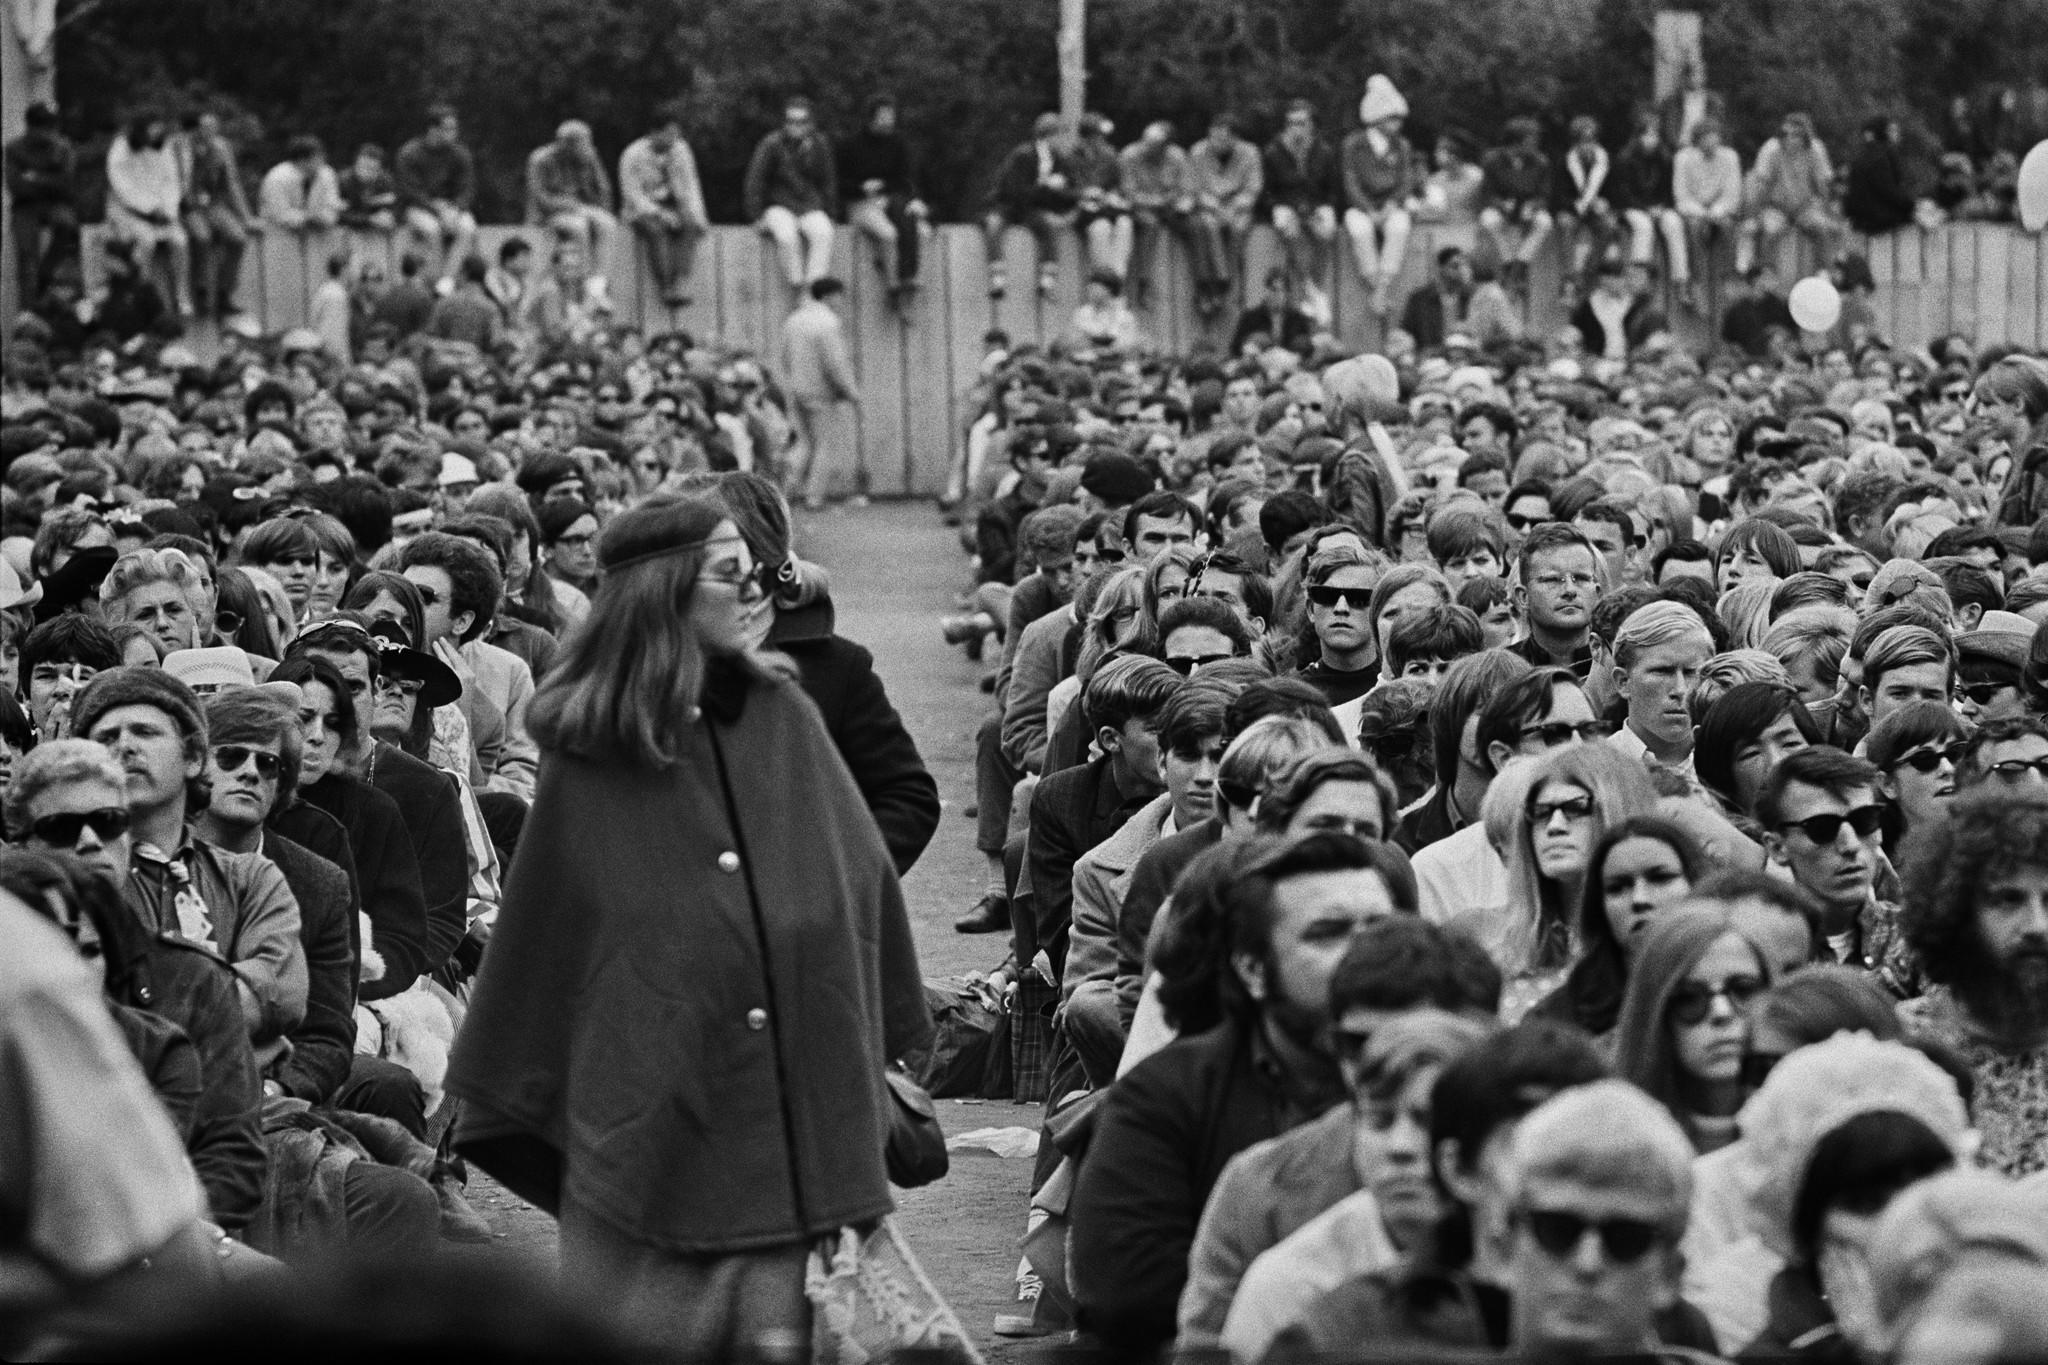 Monterey International Pop Festival, June 18, 1967, in Monterey, Calif.